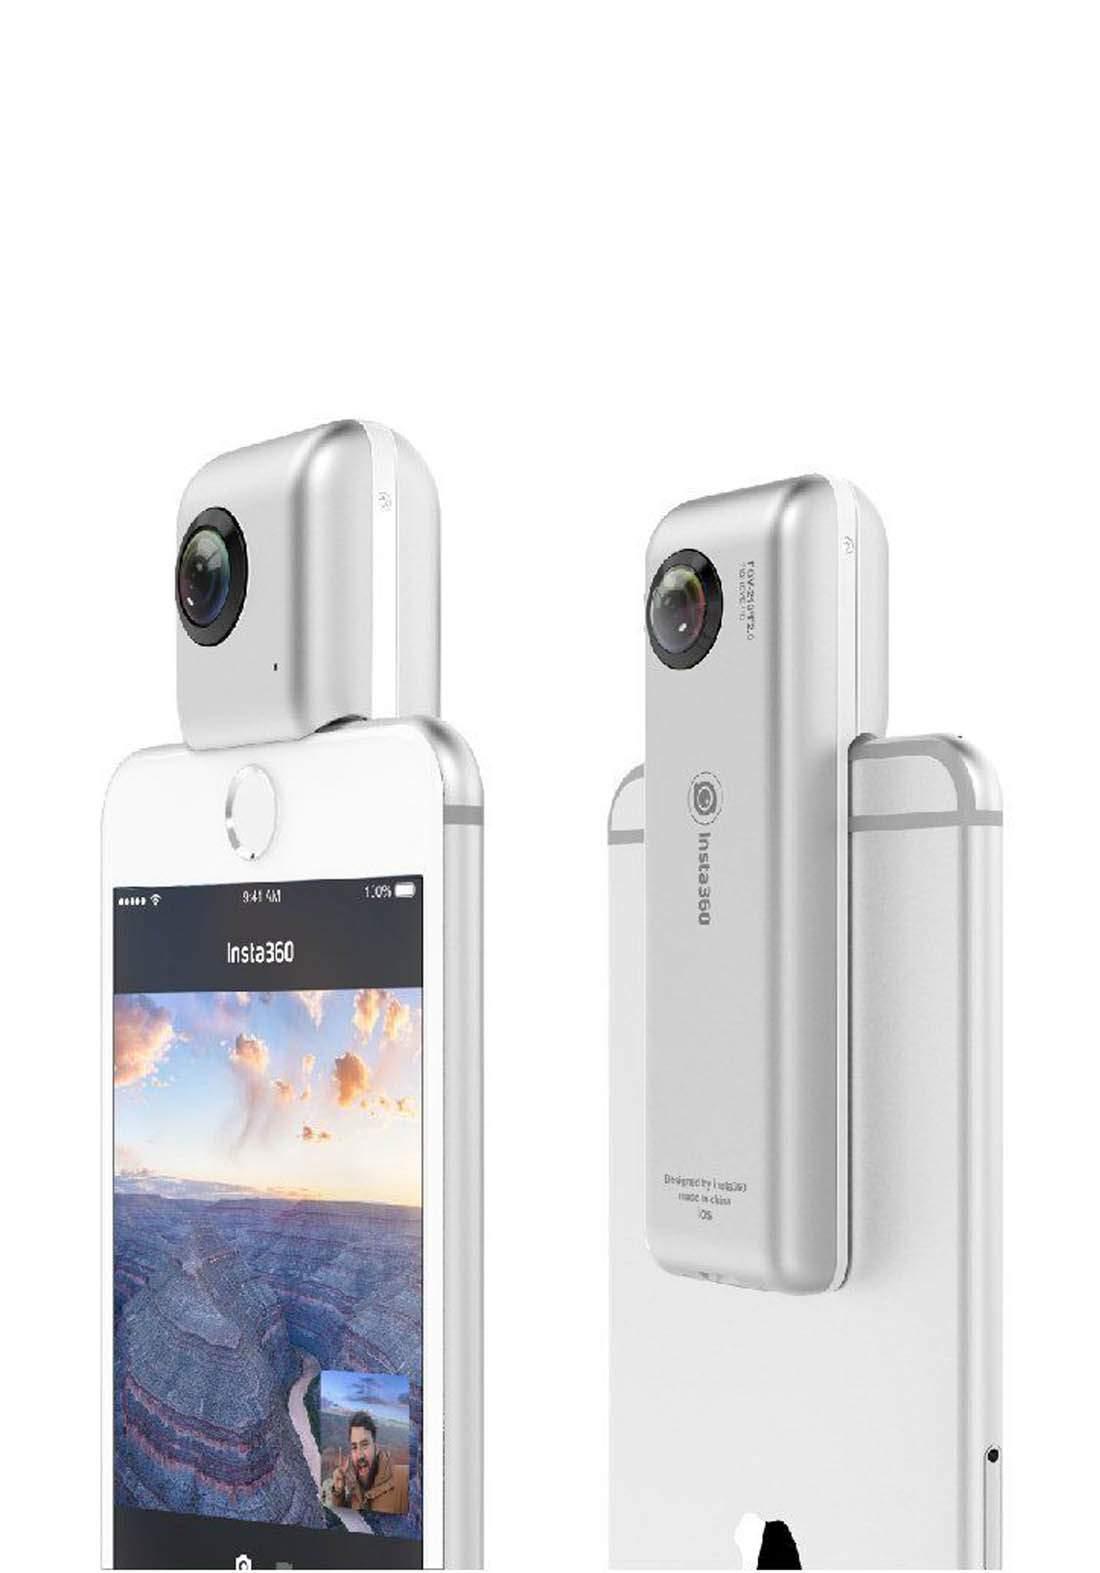 Insta360 Nano Panoramic Video Camera - White  عدسة كاميرا للهاتف